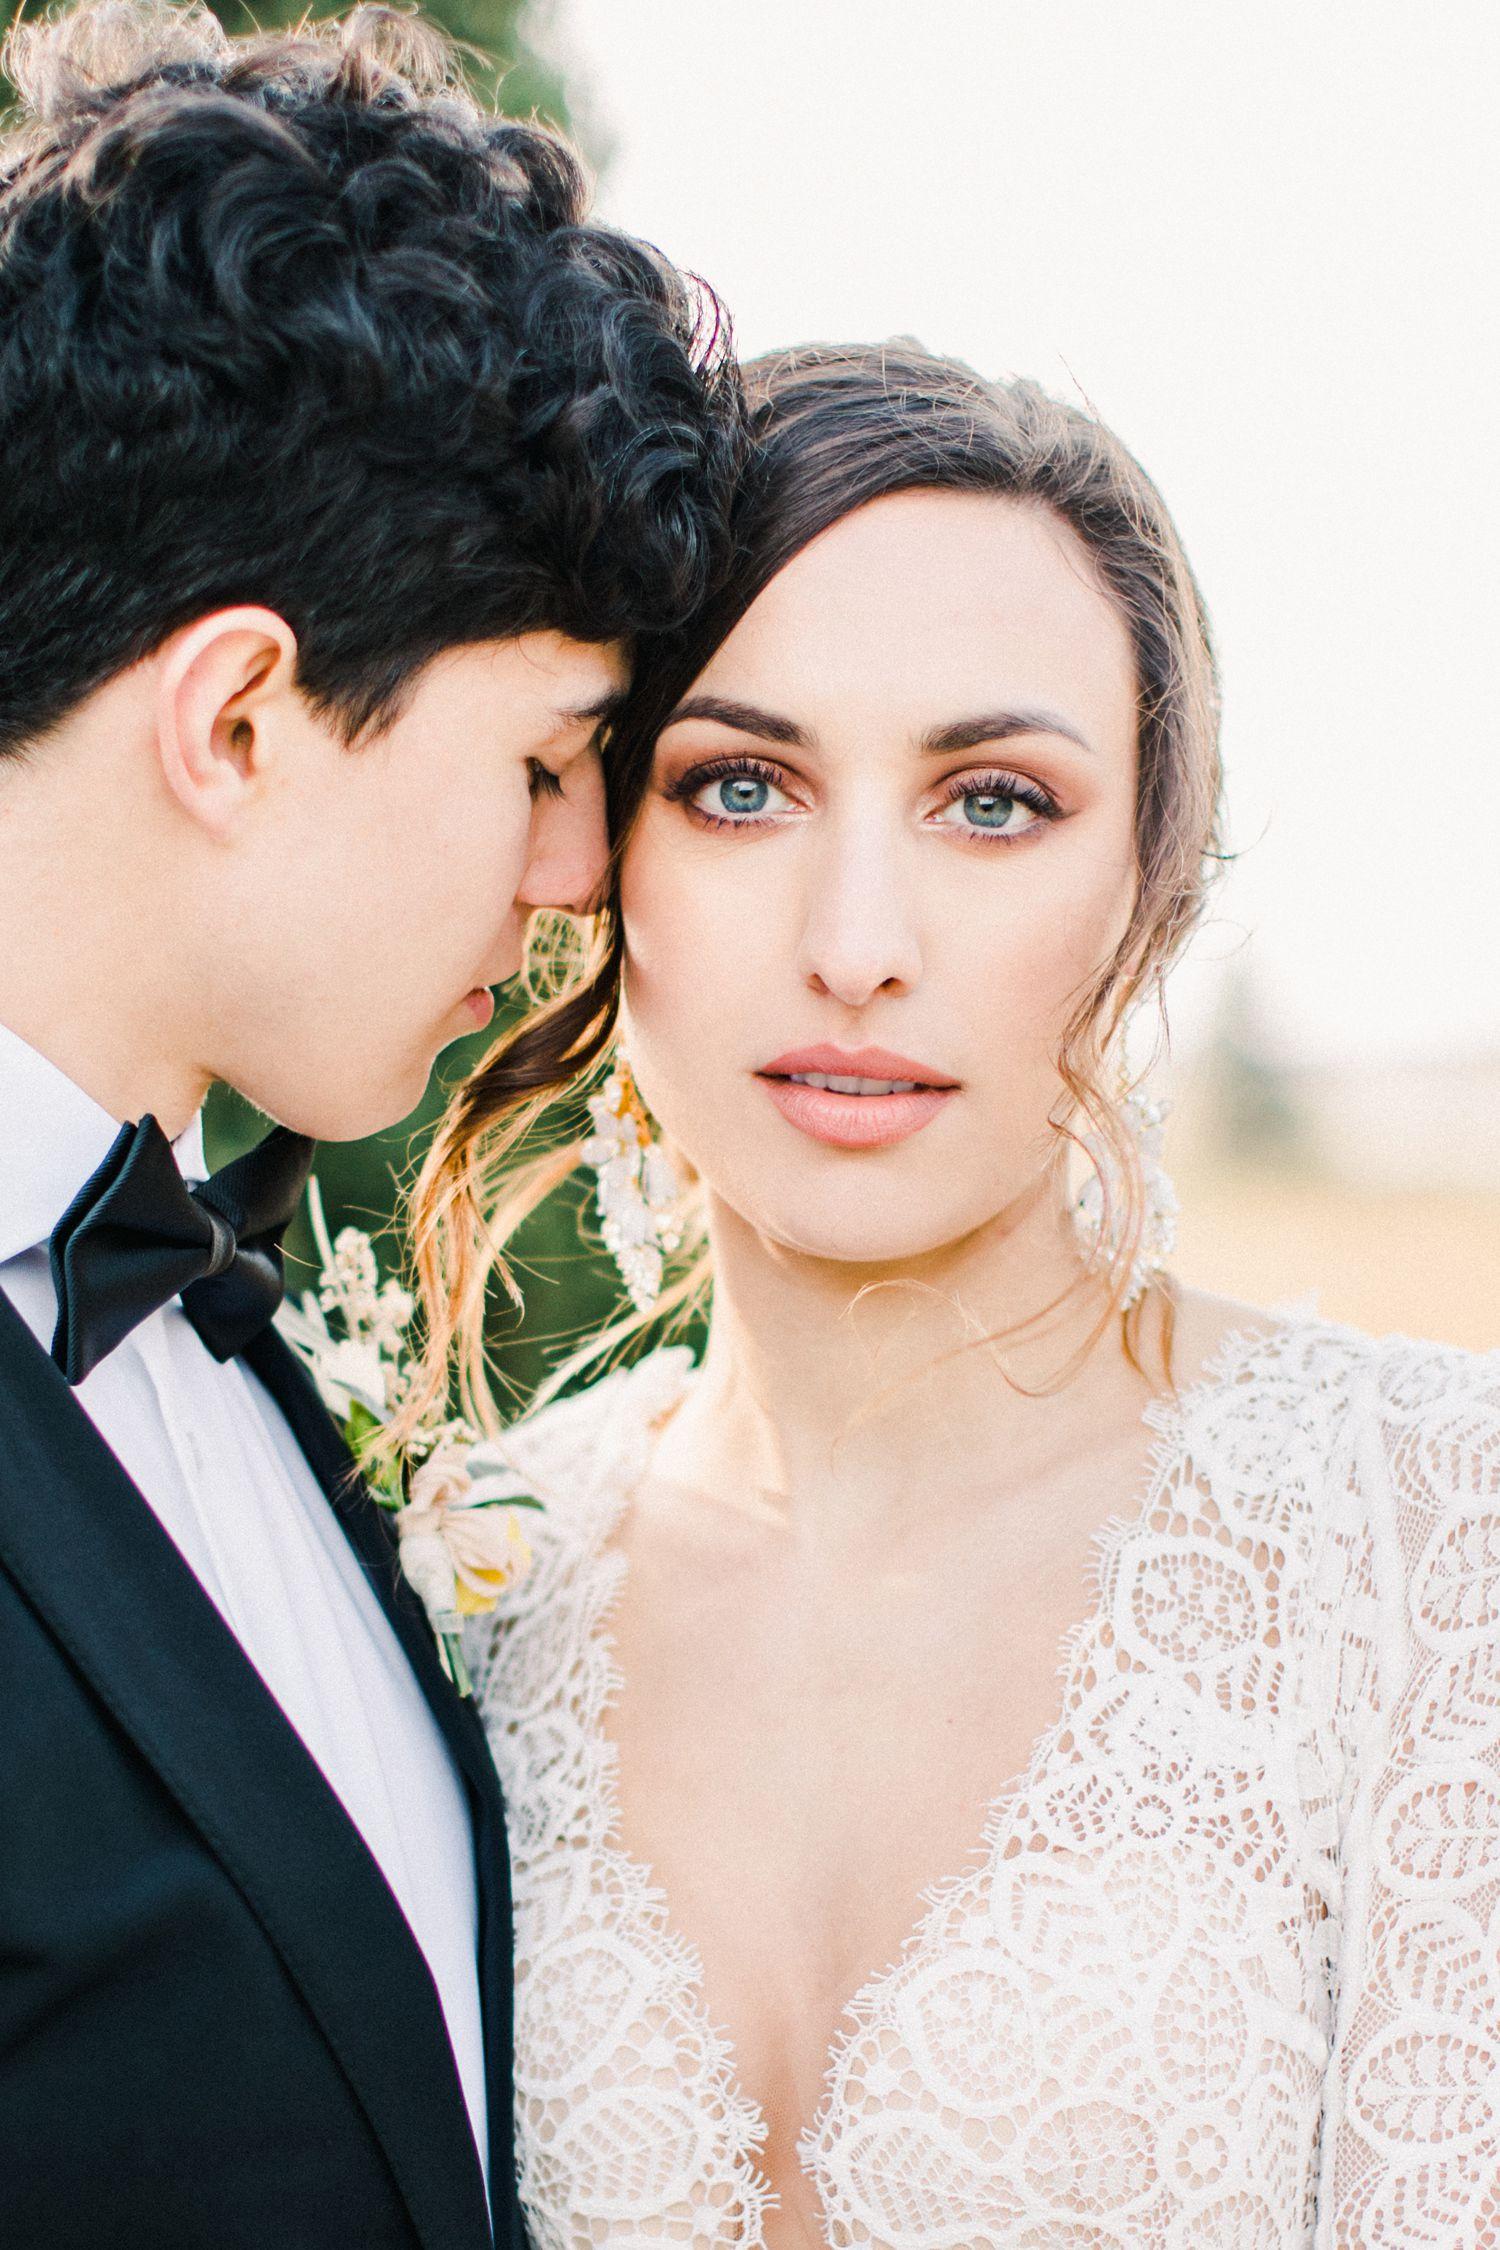 Ewigmein-Fine-Art-Wedding-photography-Tuscany-Villa-Ivana-Hochzeitsfotograf-Toskana-Italien_1604